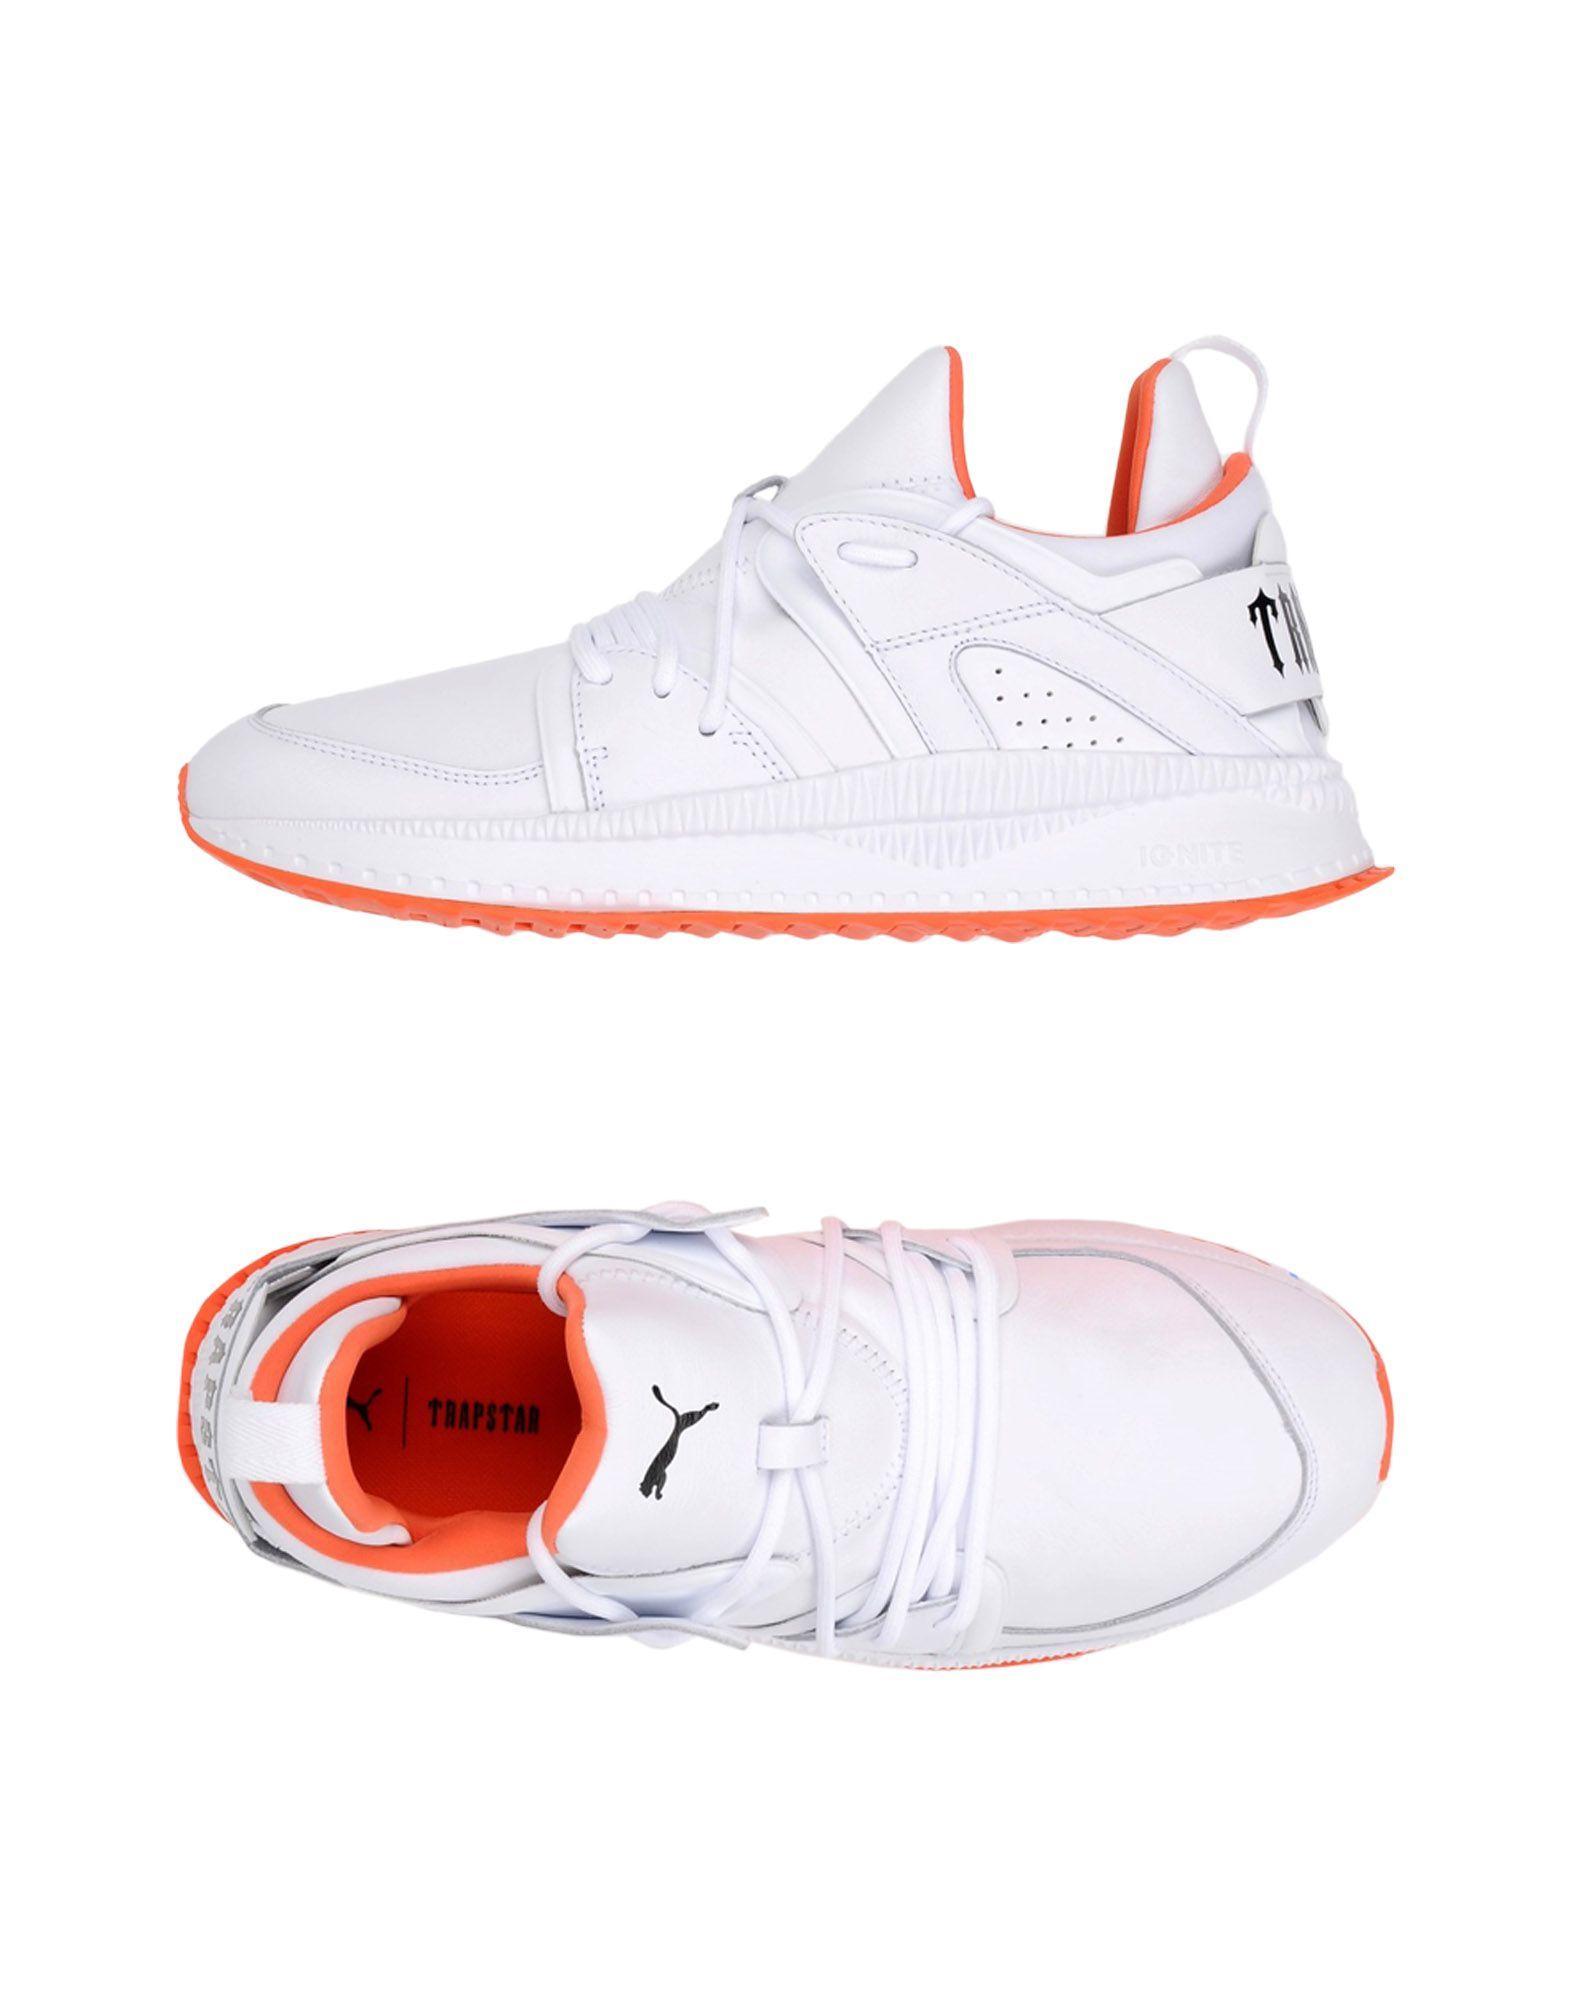 Sneakers Puma X Trapstar  Tsugi B.O.G - Uomo - Acquista online su